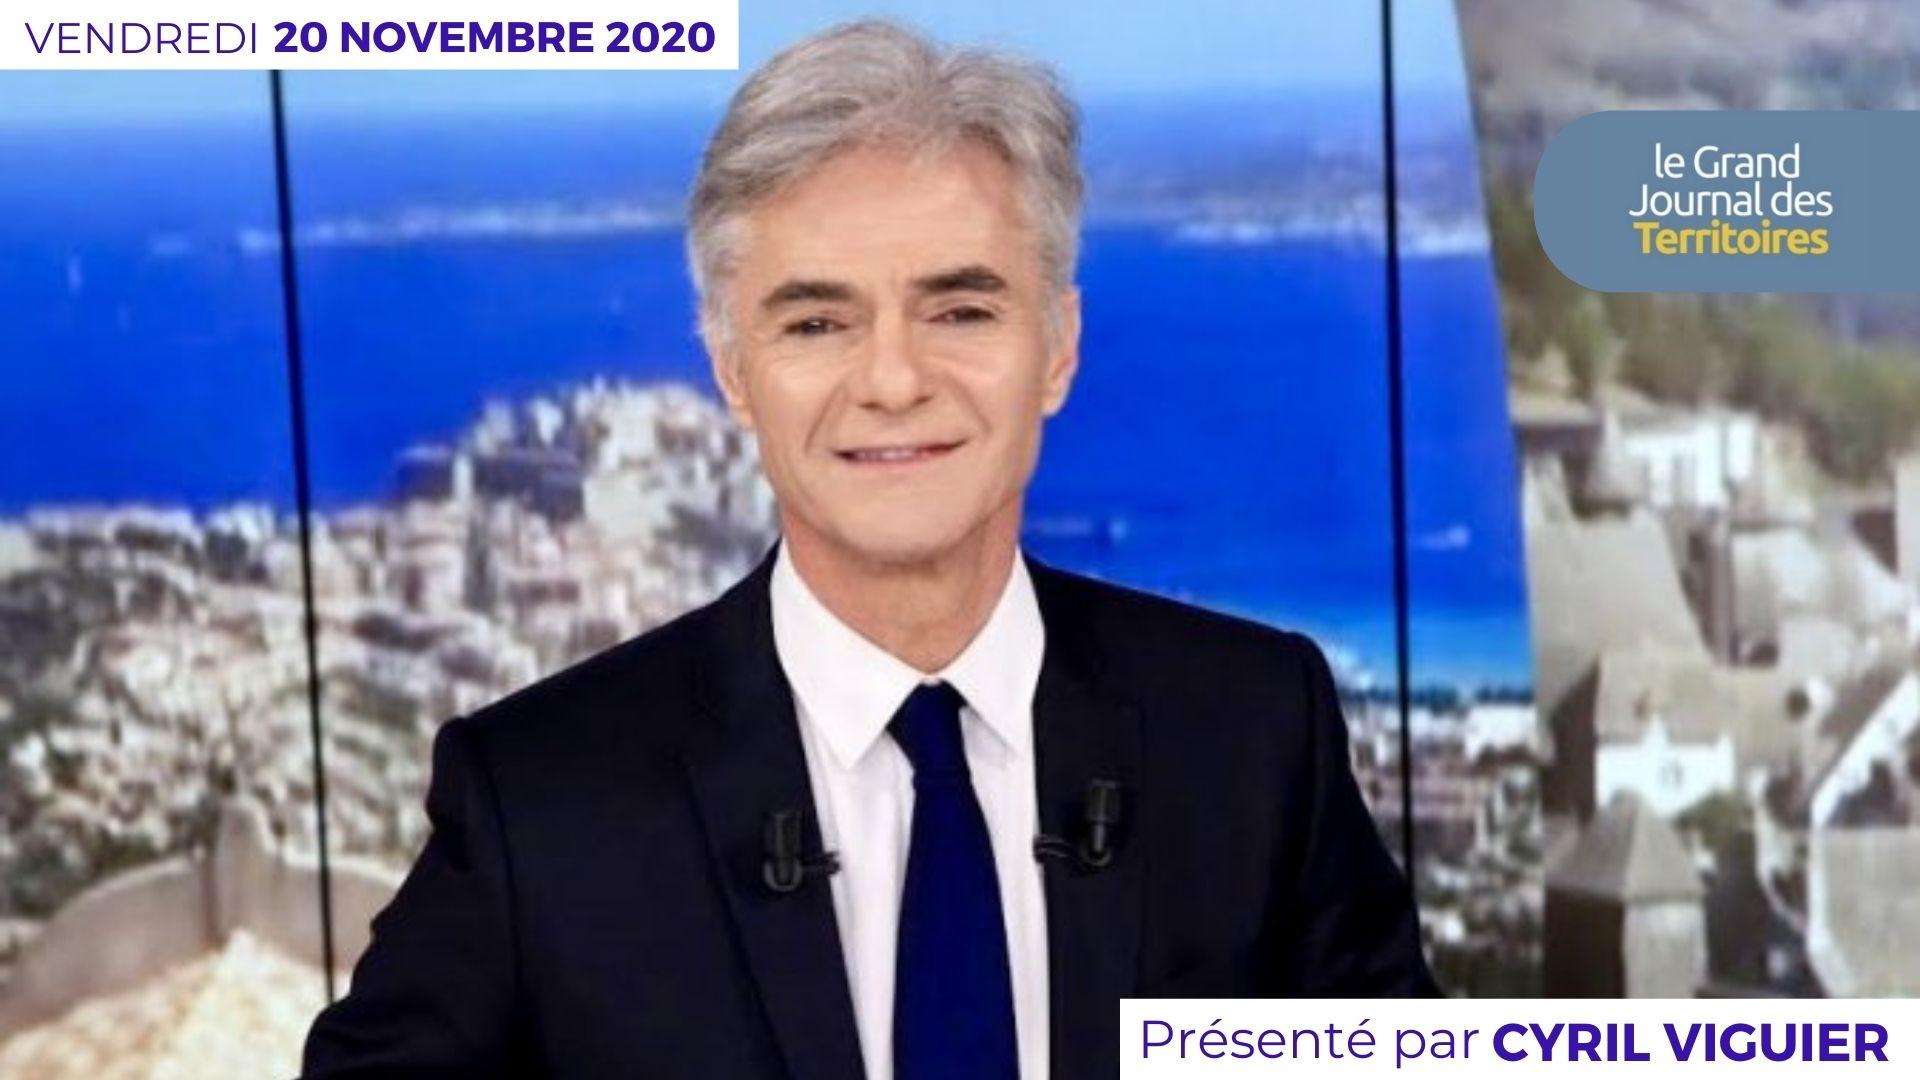 Le Grand JT des Territoires – 20 novembre 2020